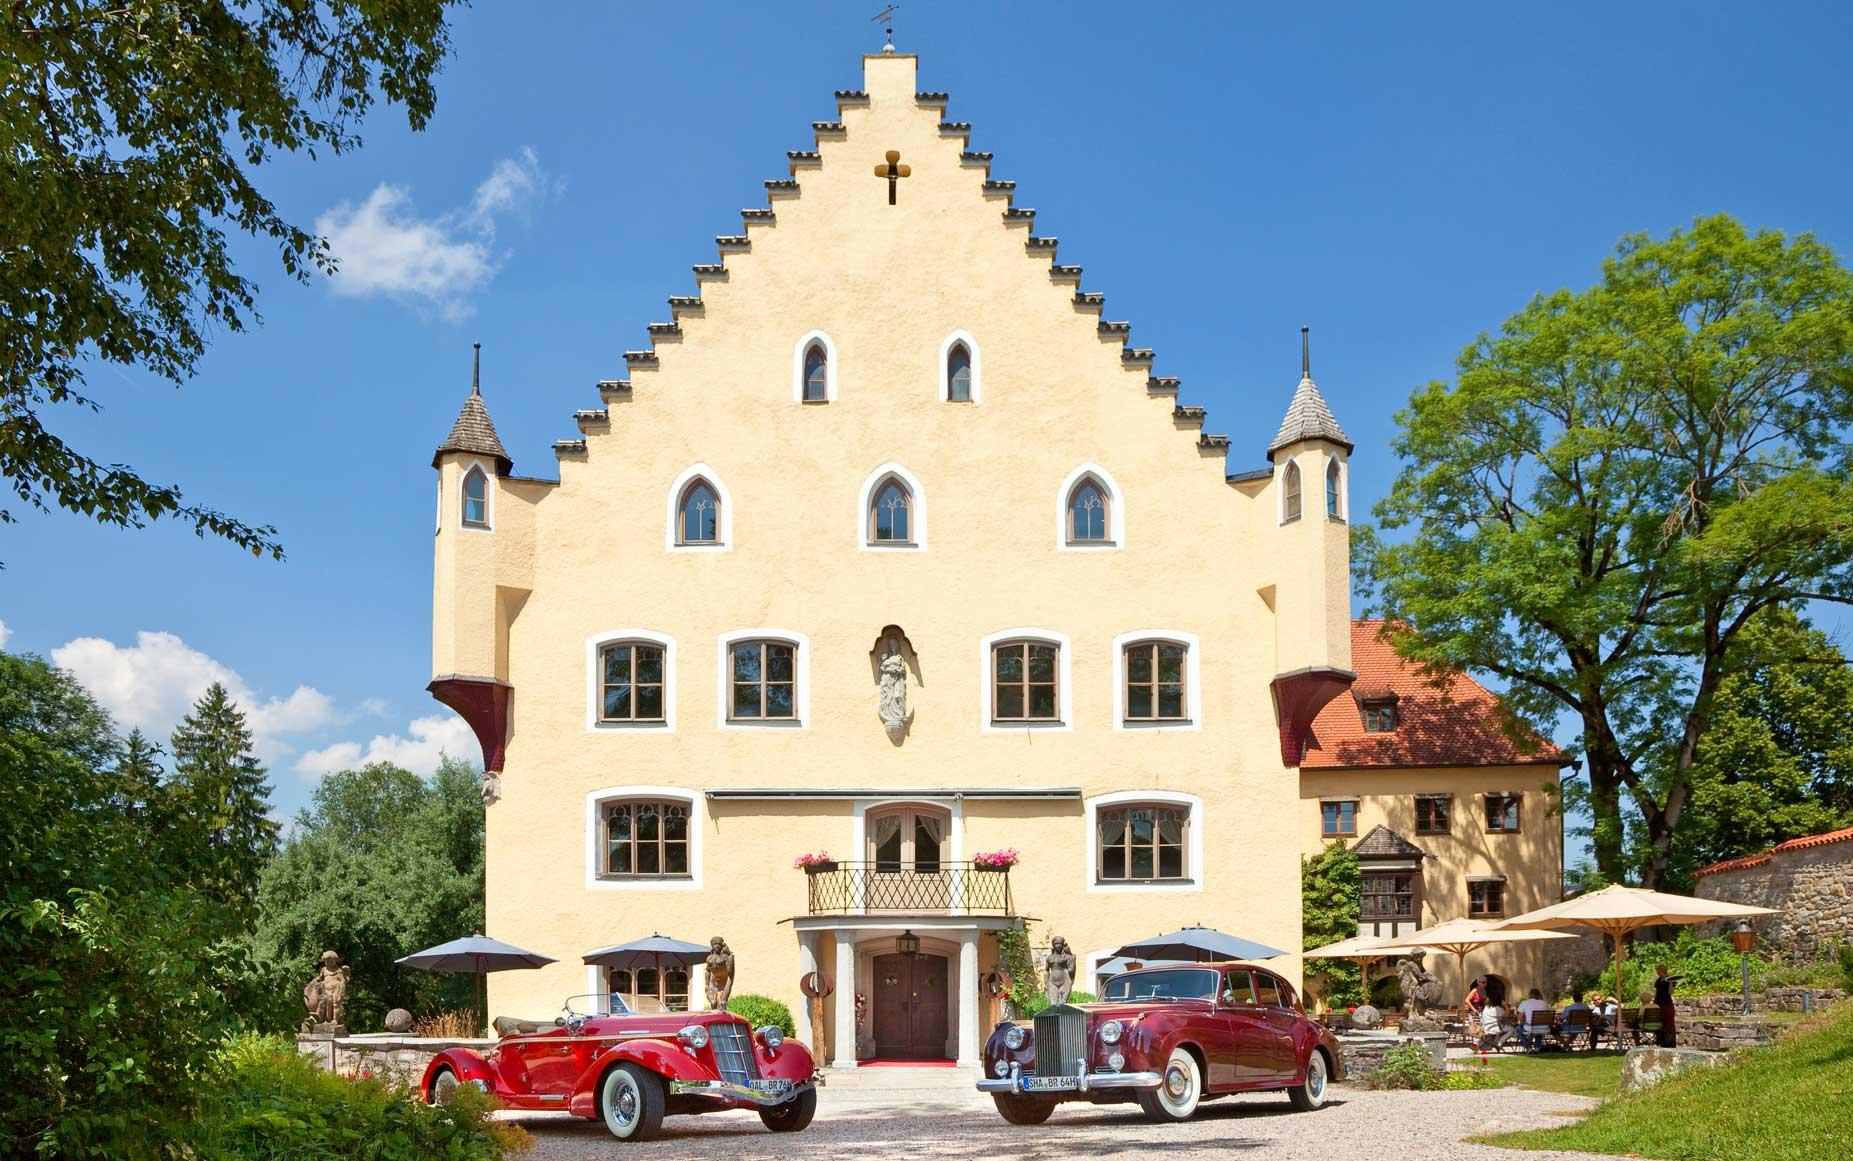 Schloss zu Hopferau, Allgäu